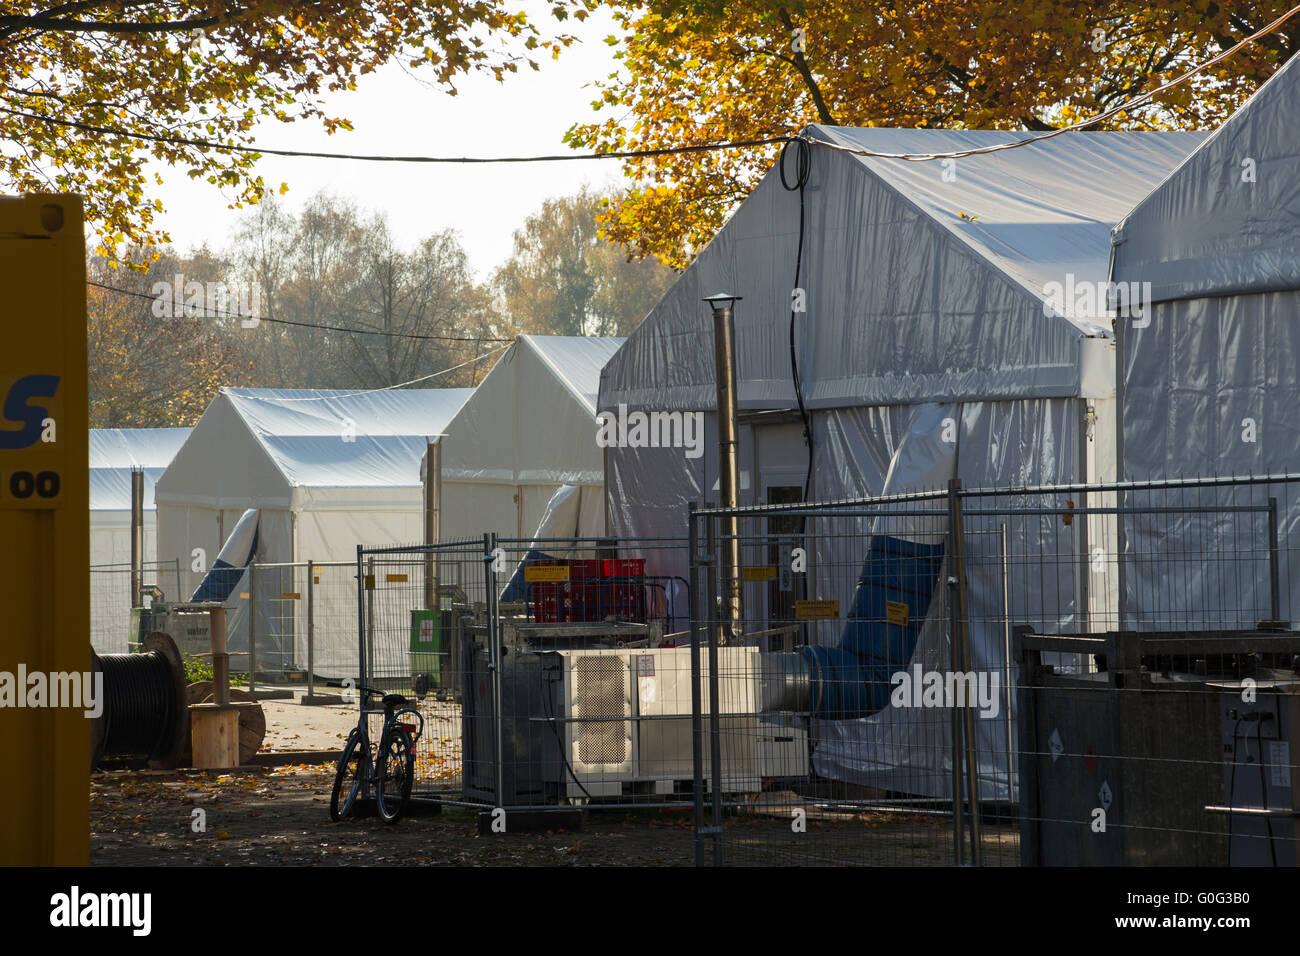 refugee camp - Stock Image